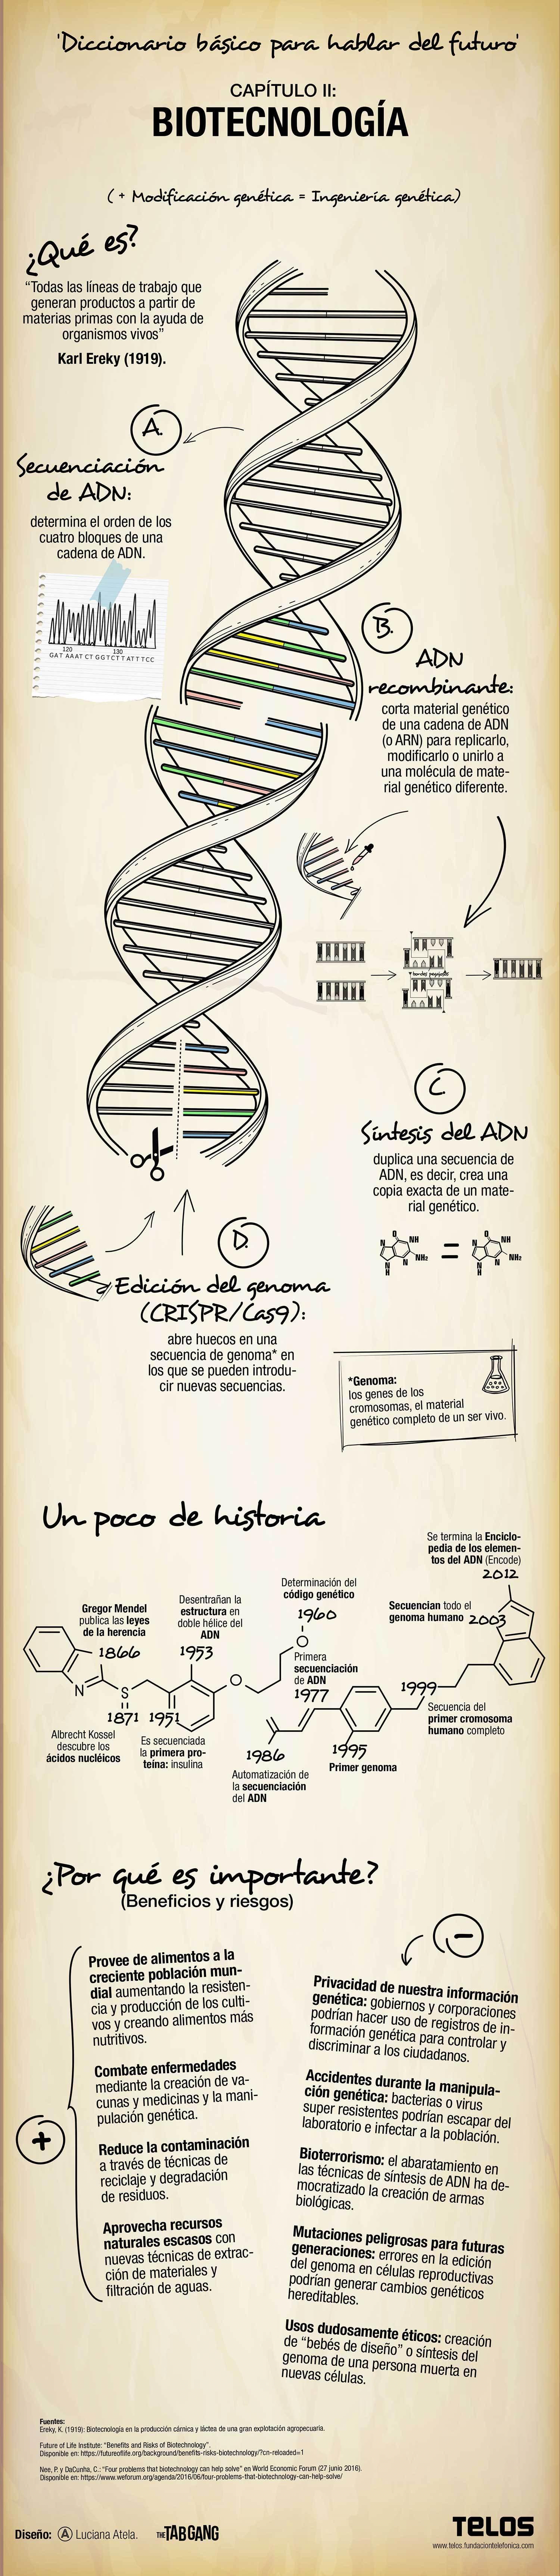 Biotecnología #infografia #infographic #tech